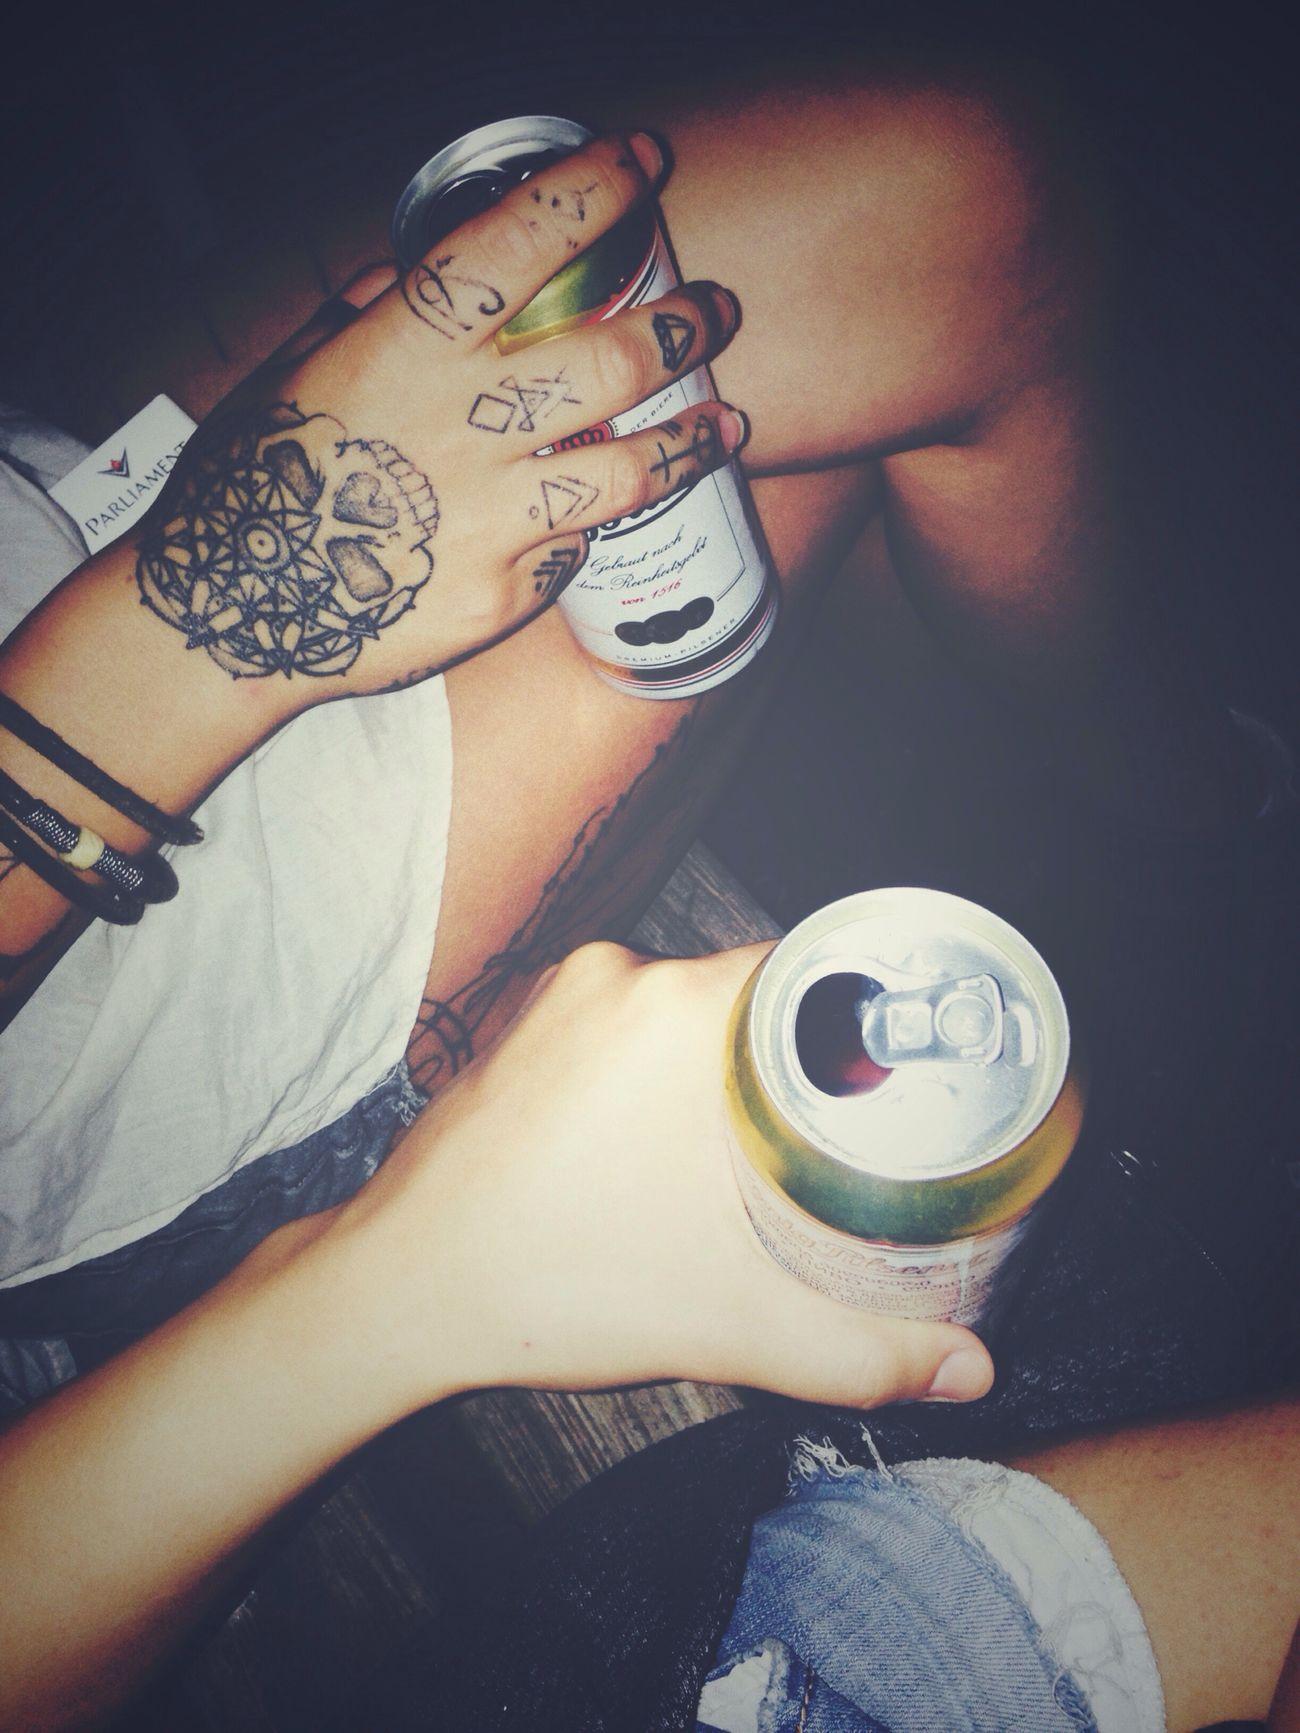 хорошоенастроение Ночь Night Sweet SweetTime Bestfriend Goodmoments Good Times Friend Sweetlife Love Beer Beer Time пивасик